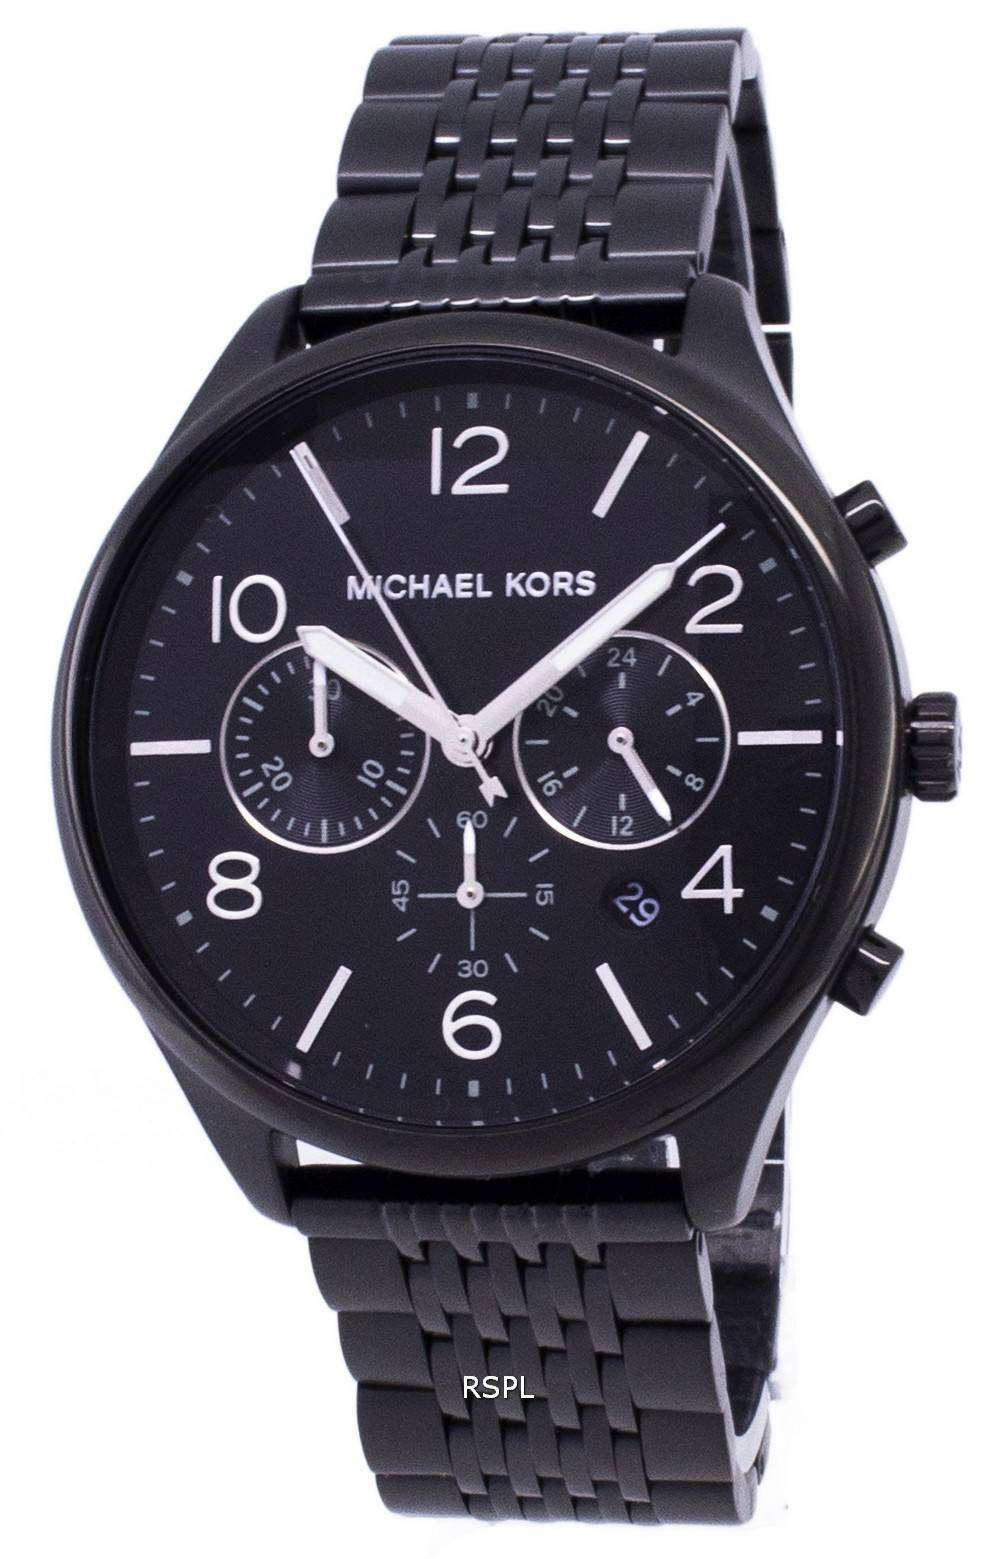 4daf2491cf5e5 Michael Kors Merrick MK8640 Chronograph Quartz Men s Watch ...